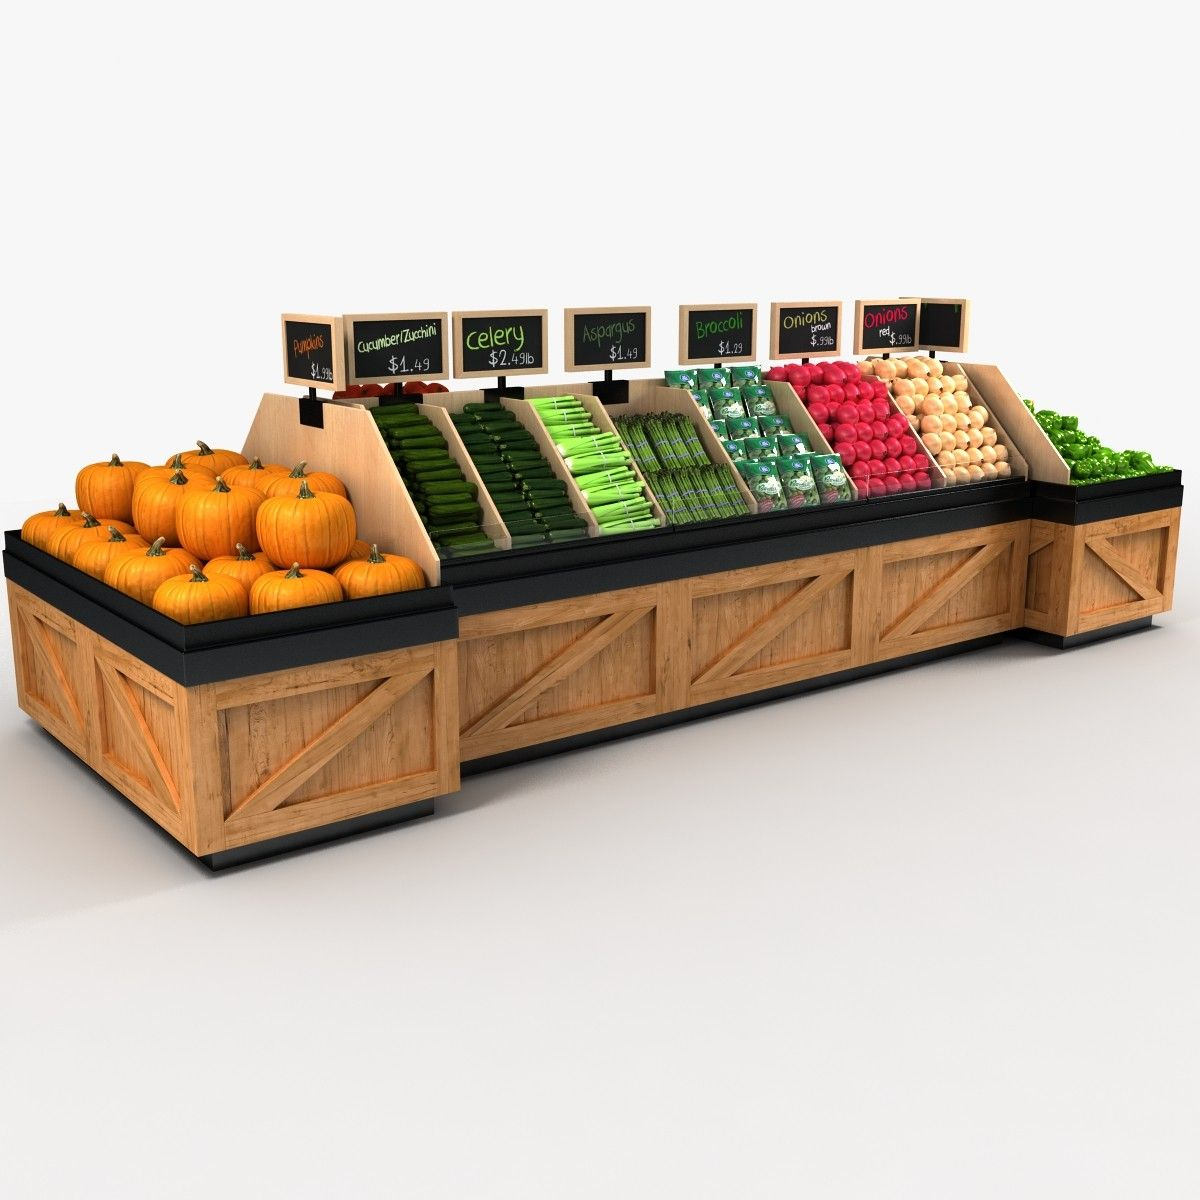 max vegetable produce Vegetable shop, Produce displays